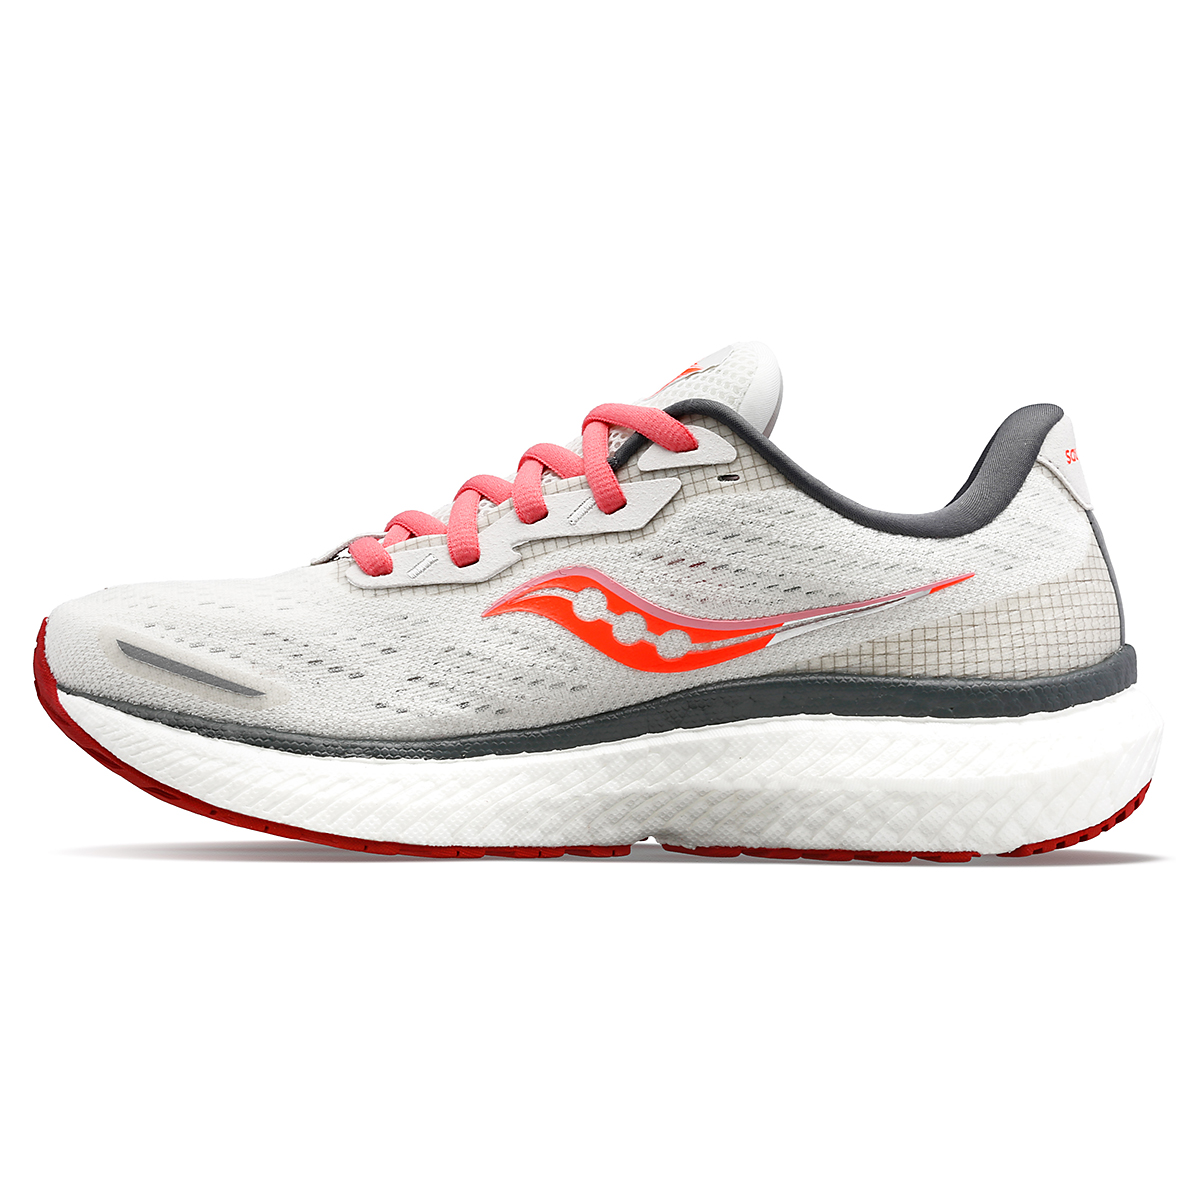 Women's Saucony Triumph 19 Running Shoe - Color: Jackalope - Size: 5 - Width: Regular, Jackalope, large, image 2